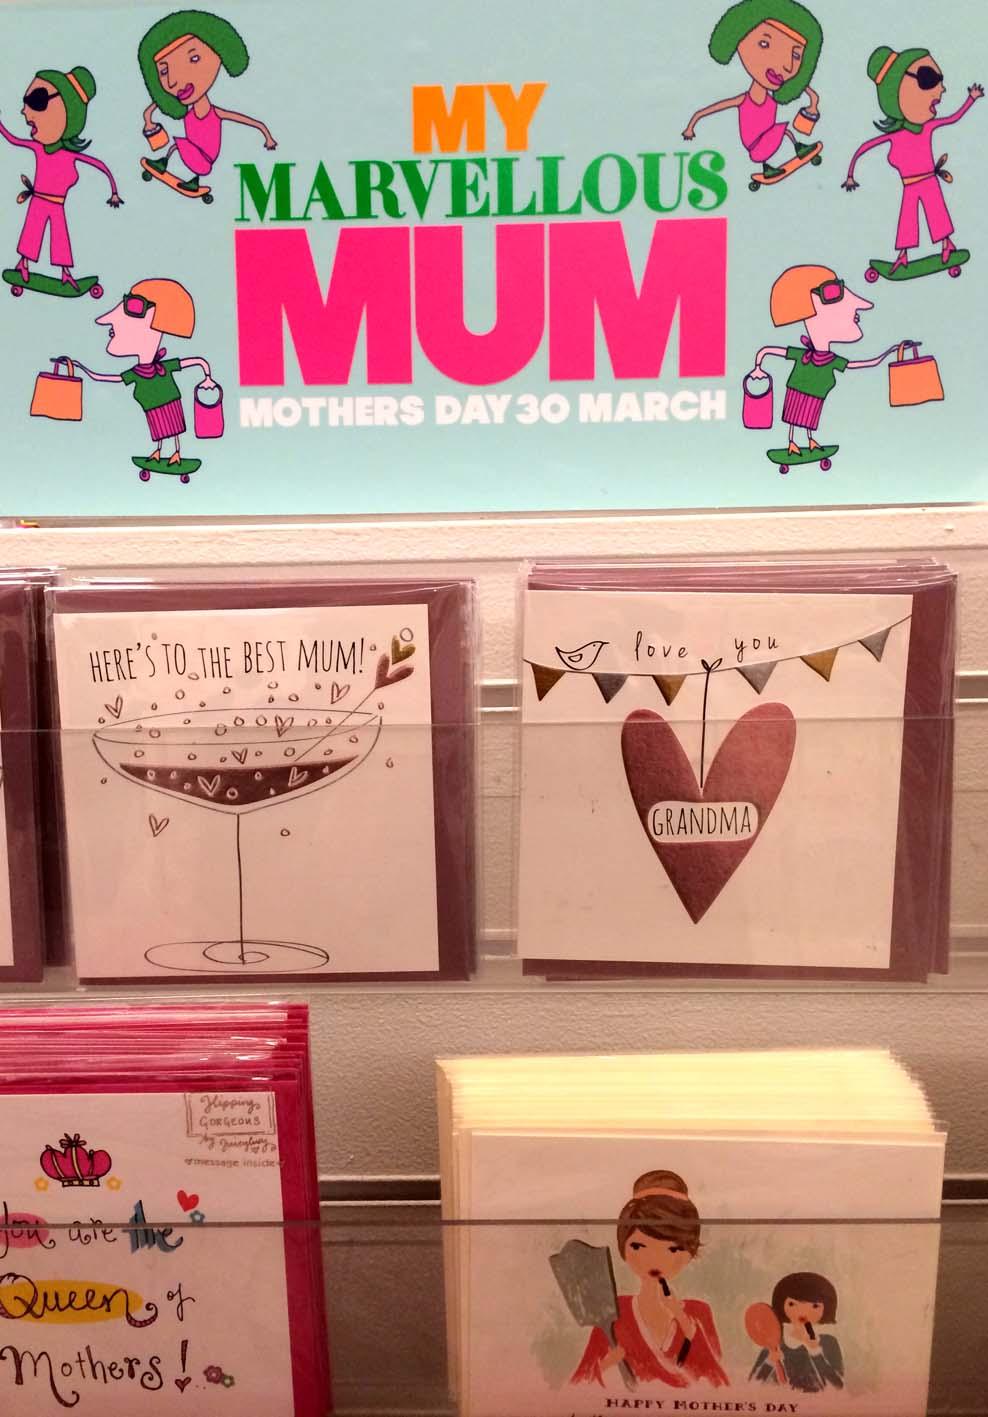 SELFRIDGES_Mothers_Day_2014_3